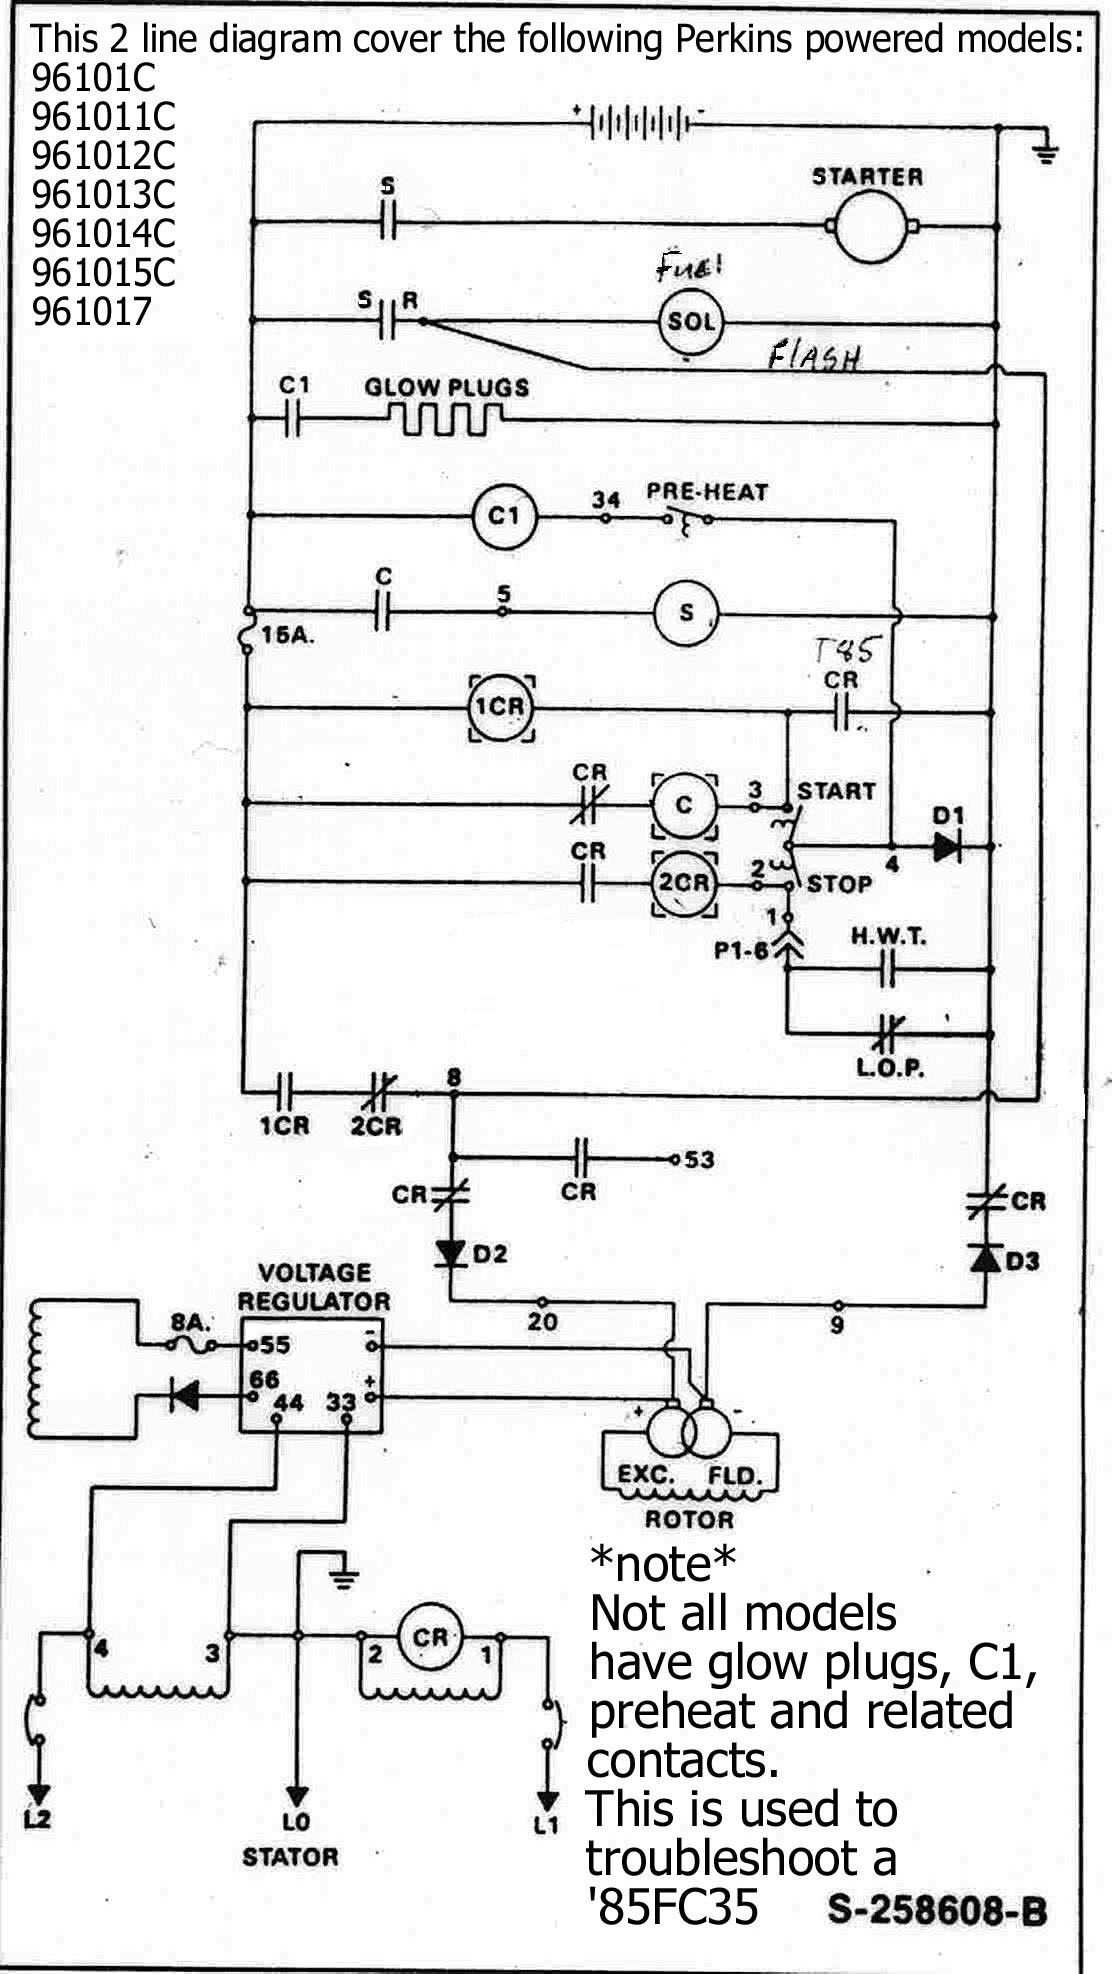 New Perkins Generator Wiring Diagram | Diagram, Line diagram, WirePinterest